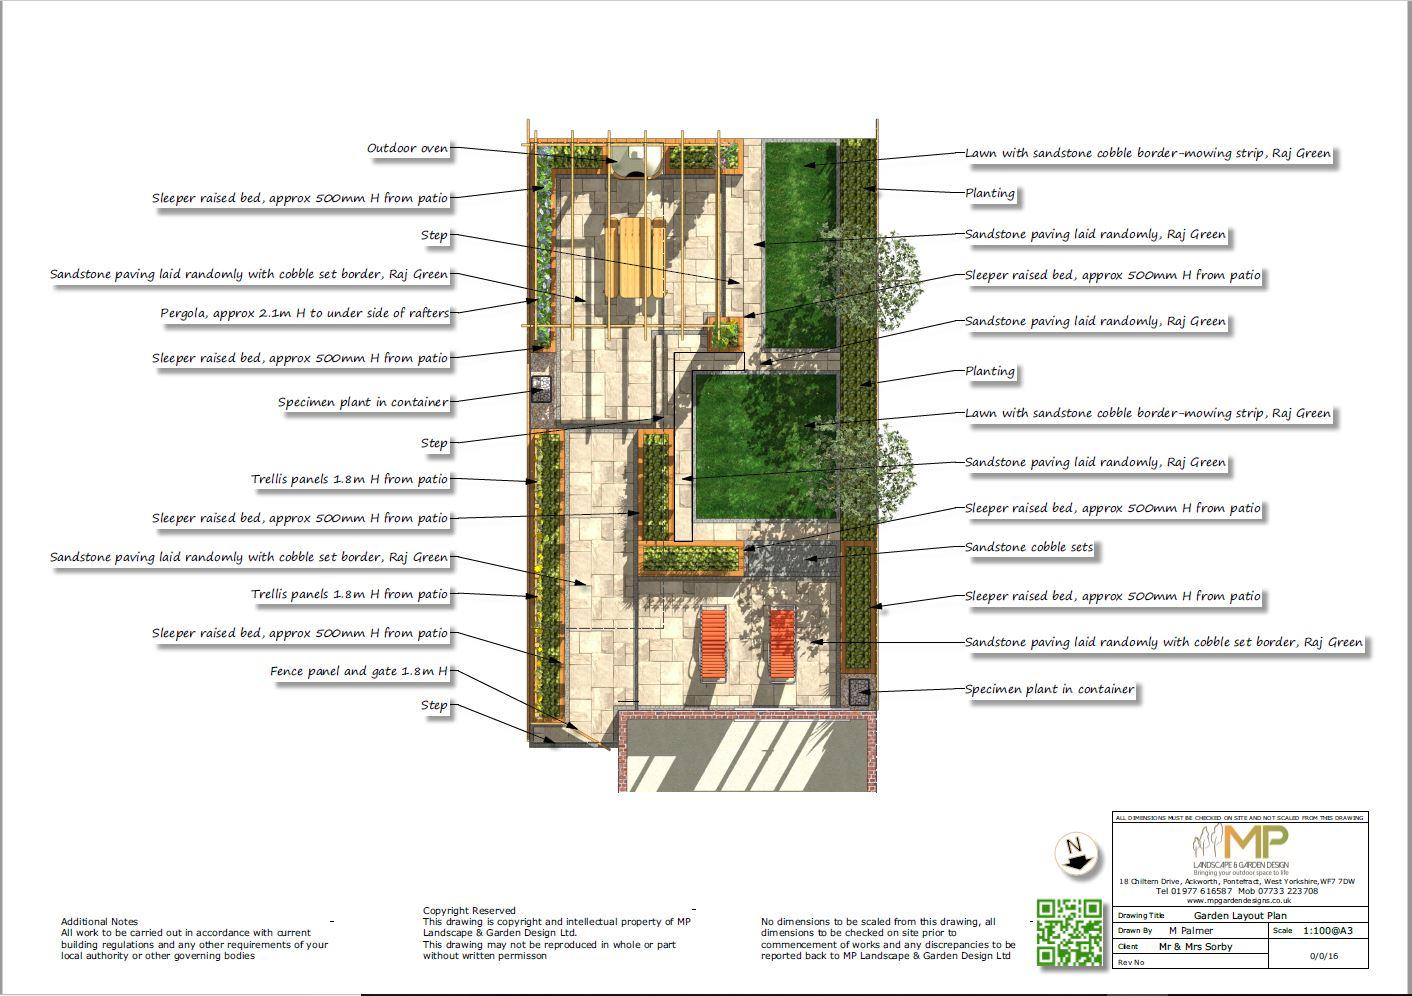 Garden layout plans for a rear garden in Pontefract, West Yorkshire.